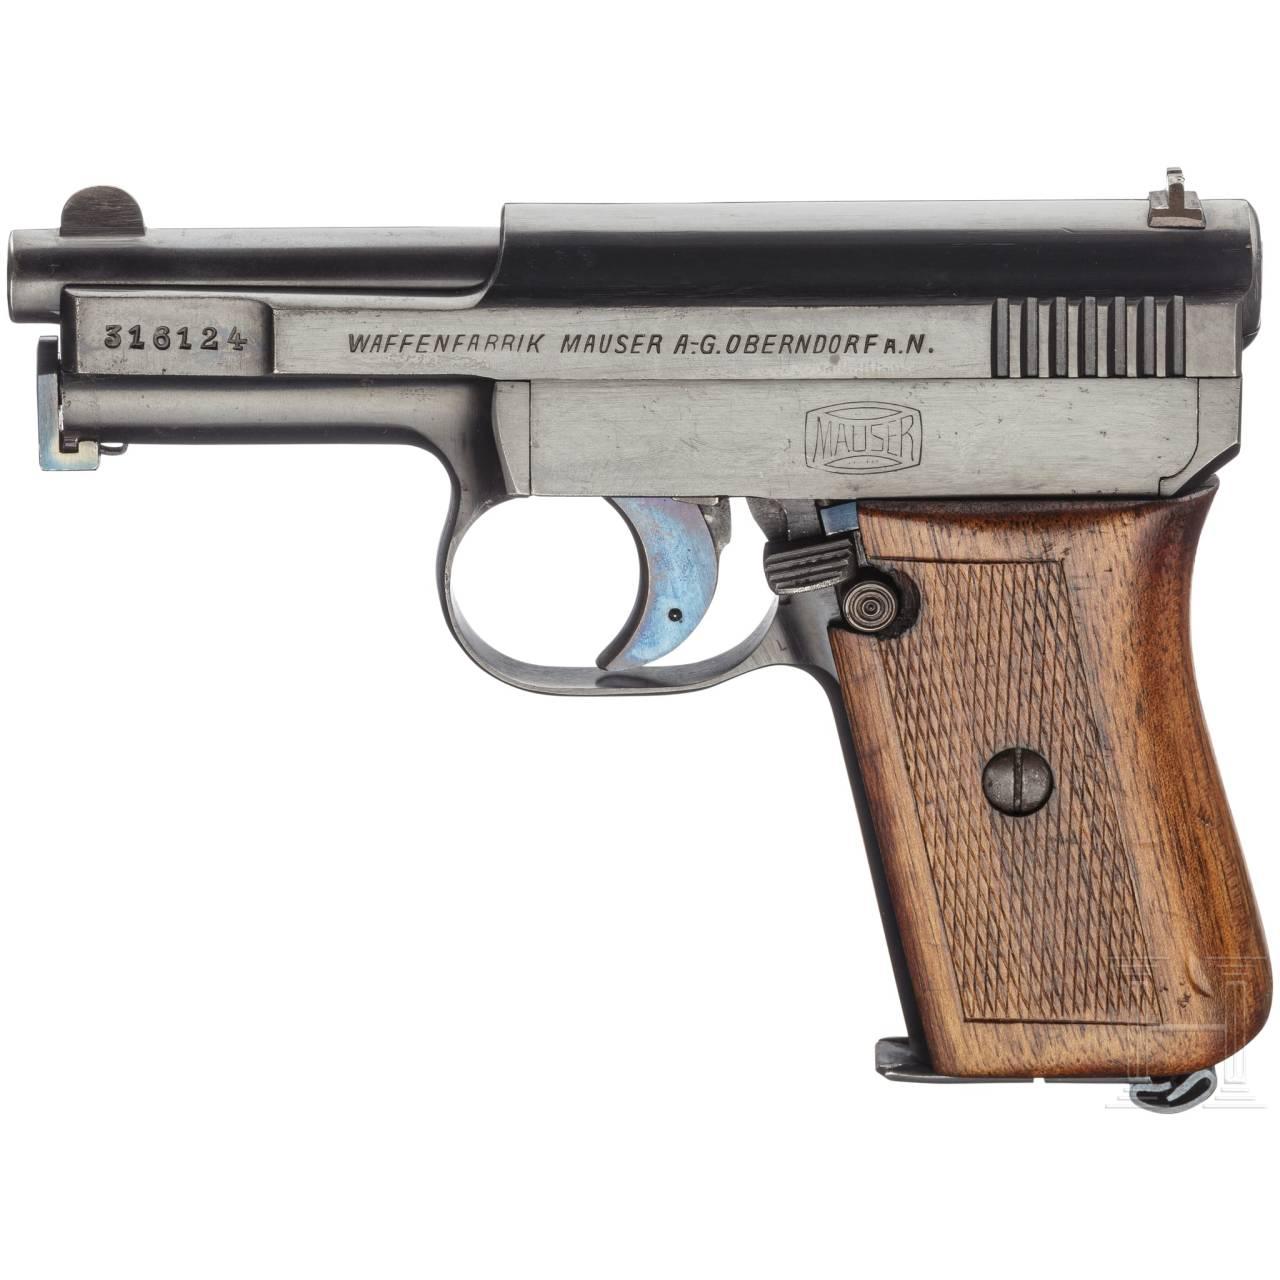 Portugal - Mauser Mod. 1910